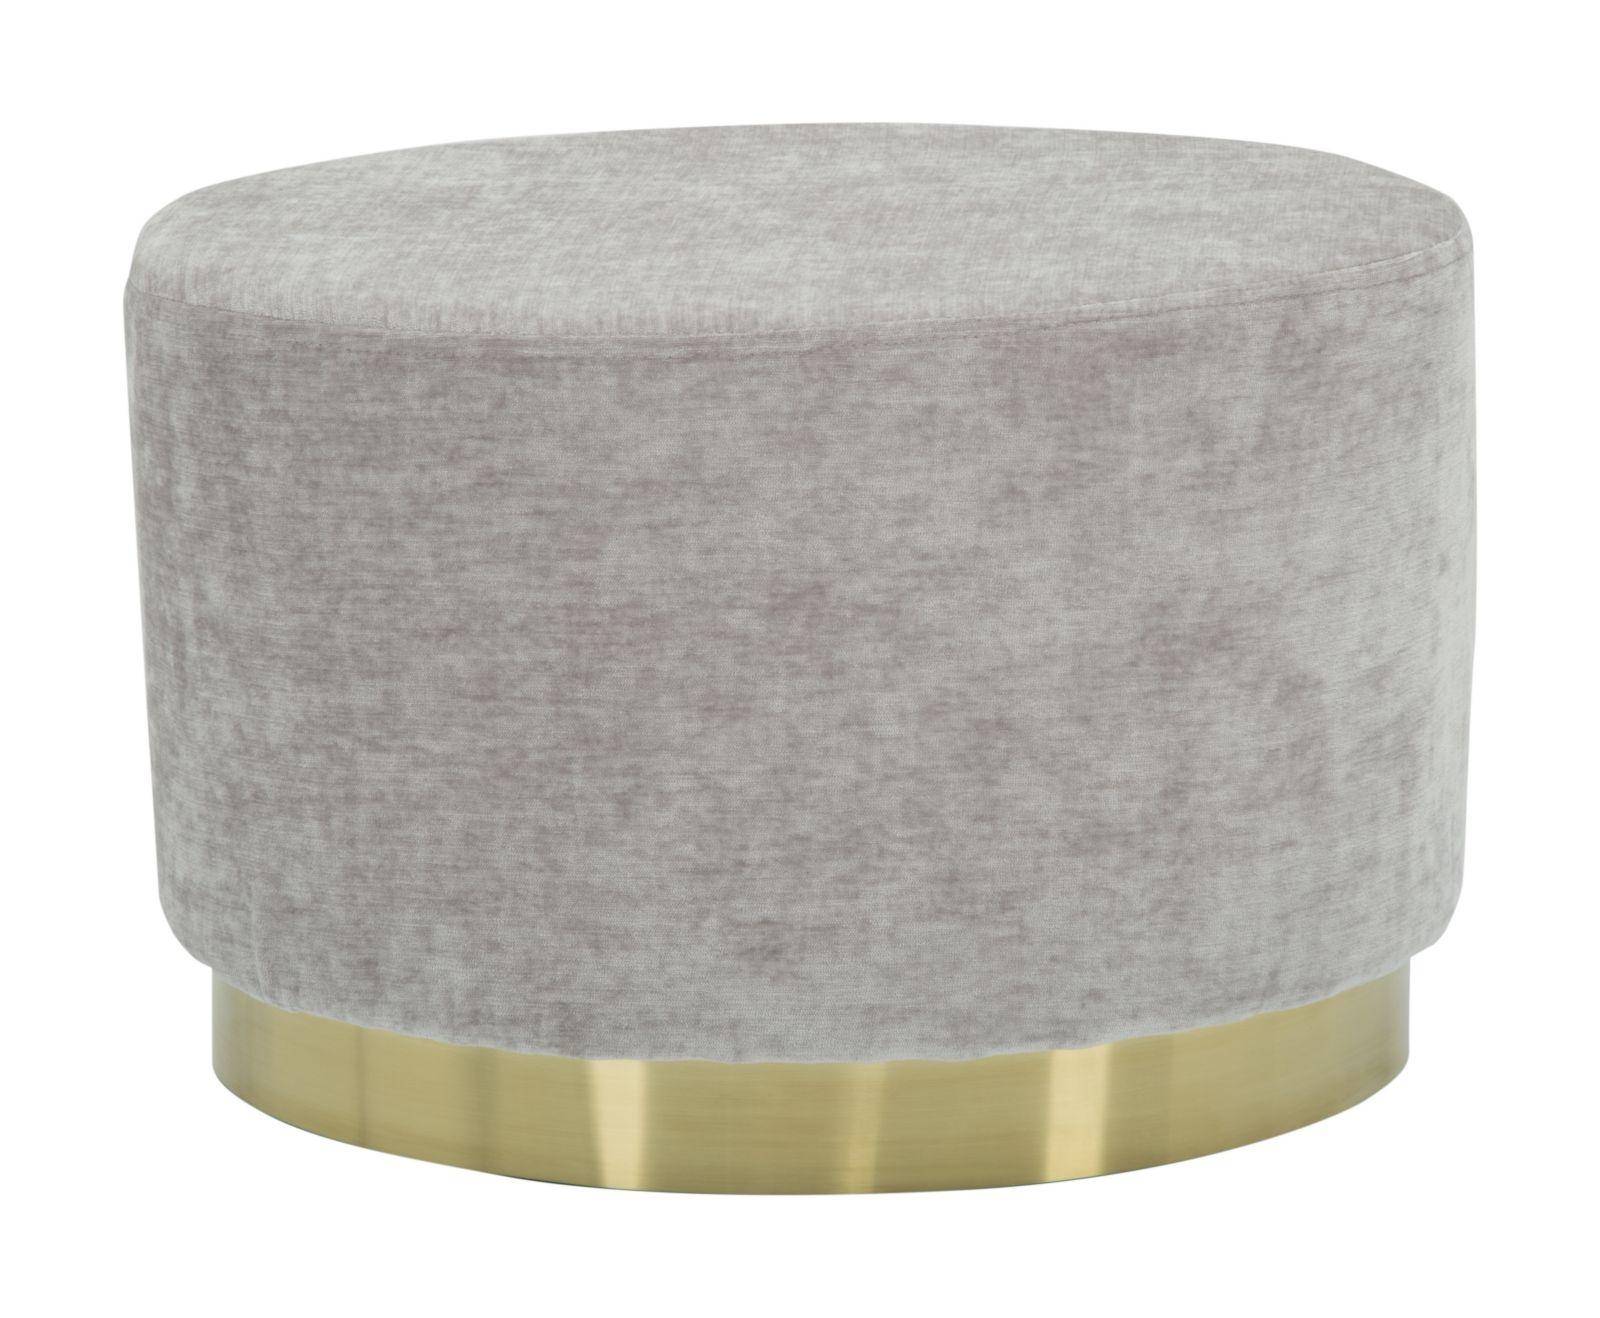 Taburet tapitat cu stofa Goldy Ovale Small Grey l52xA35xH35 cm